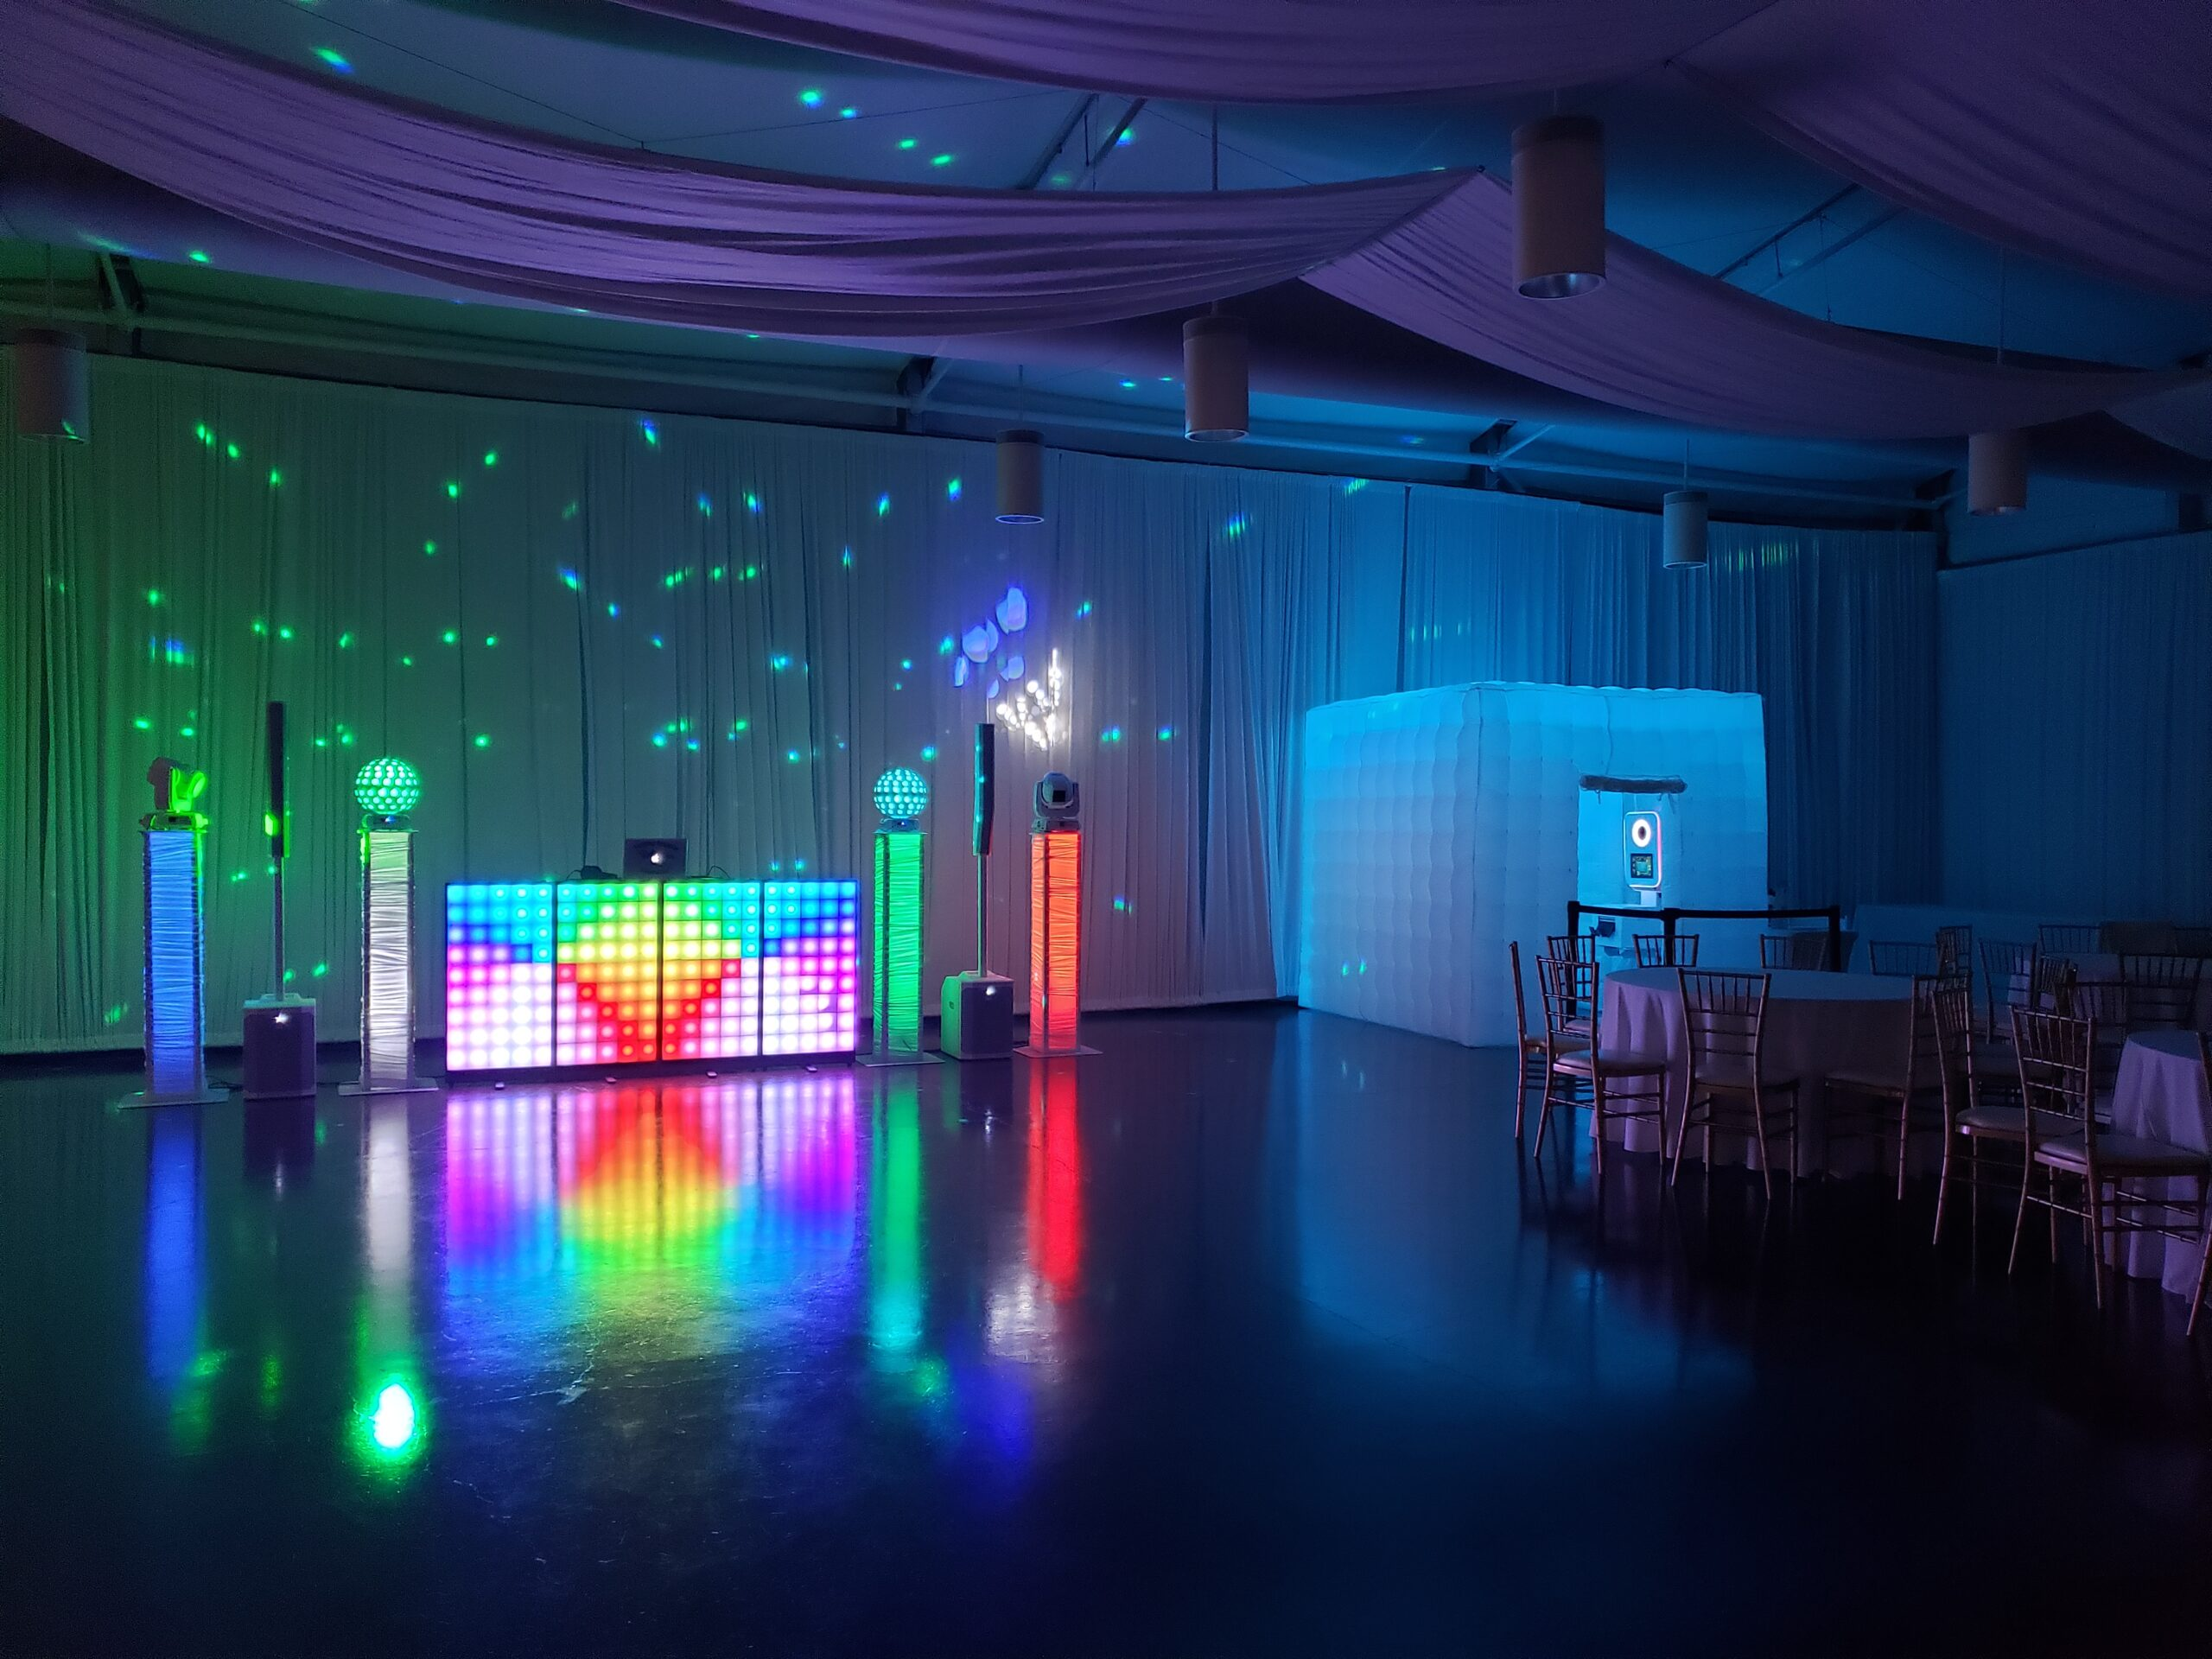 LED background and dancefloor